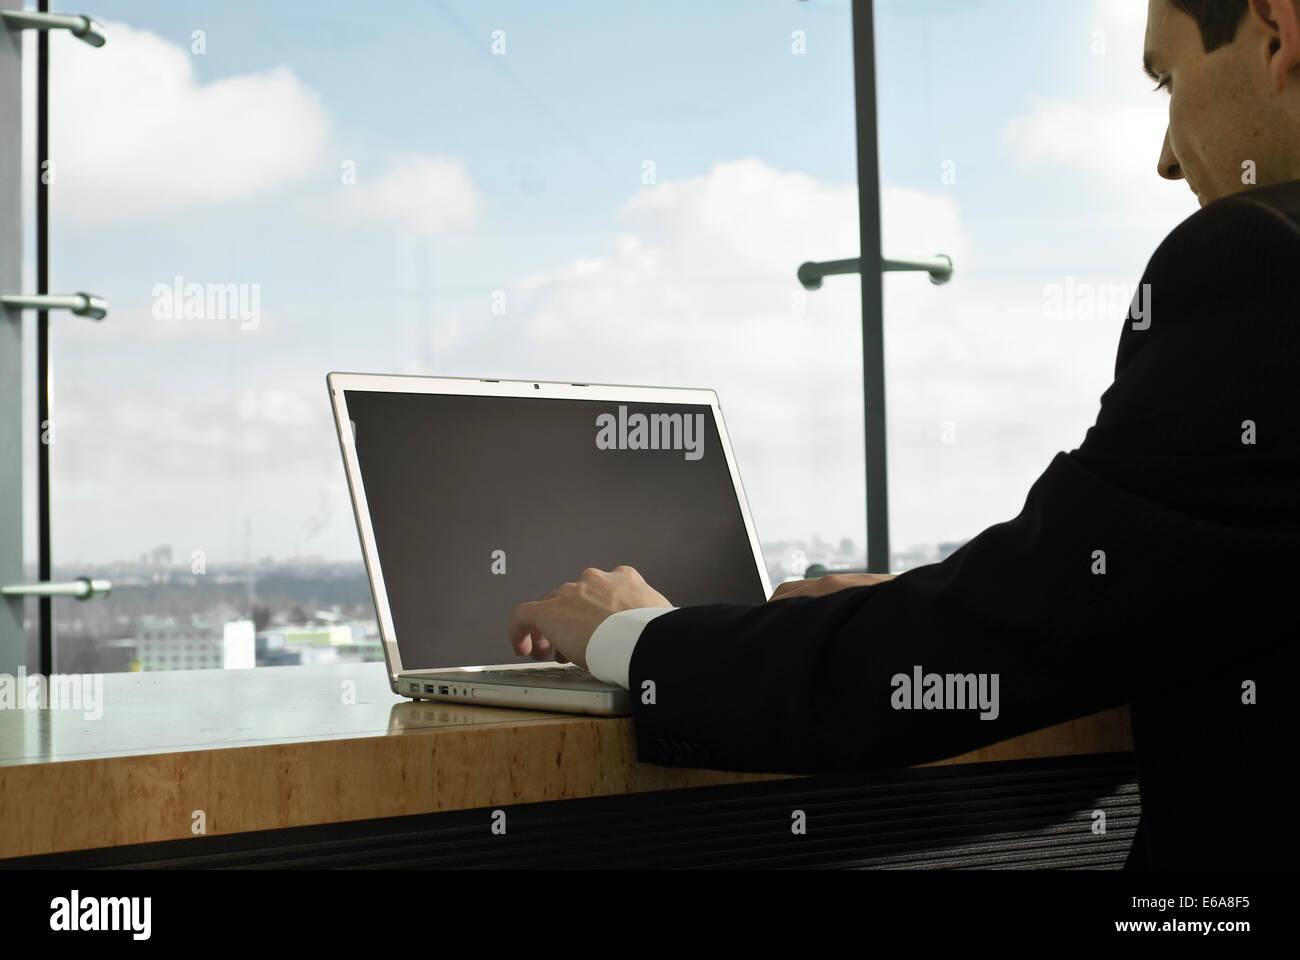 palmtop,office,workplace,mobile communication,businessman - Stock Image